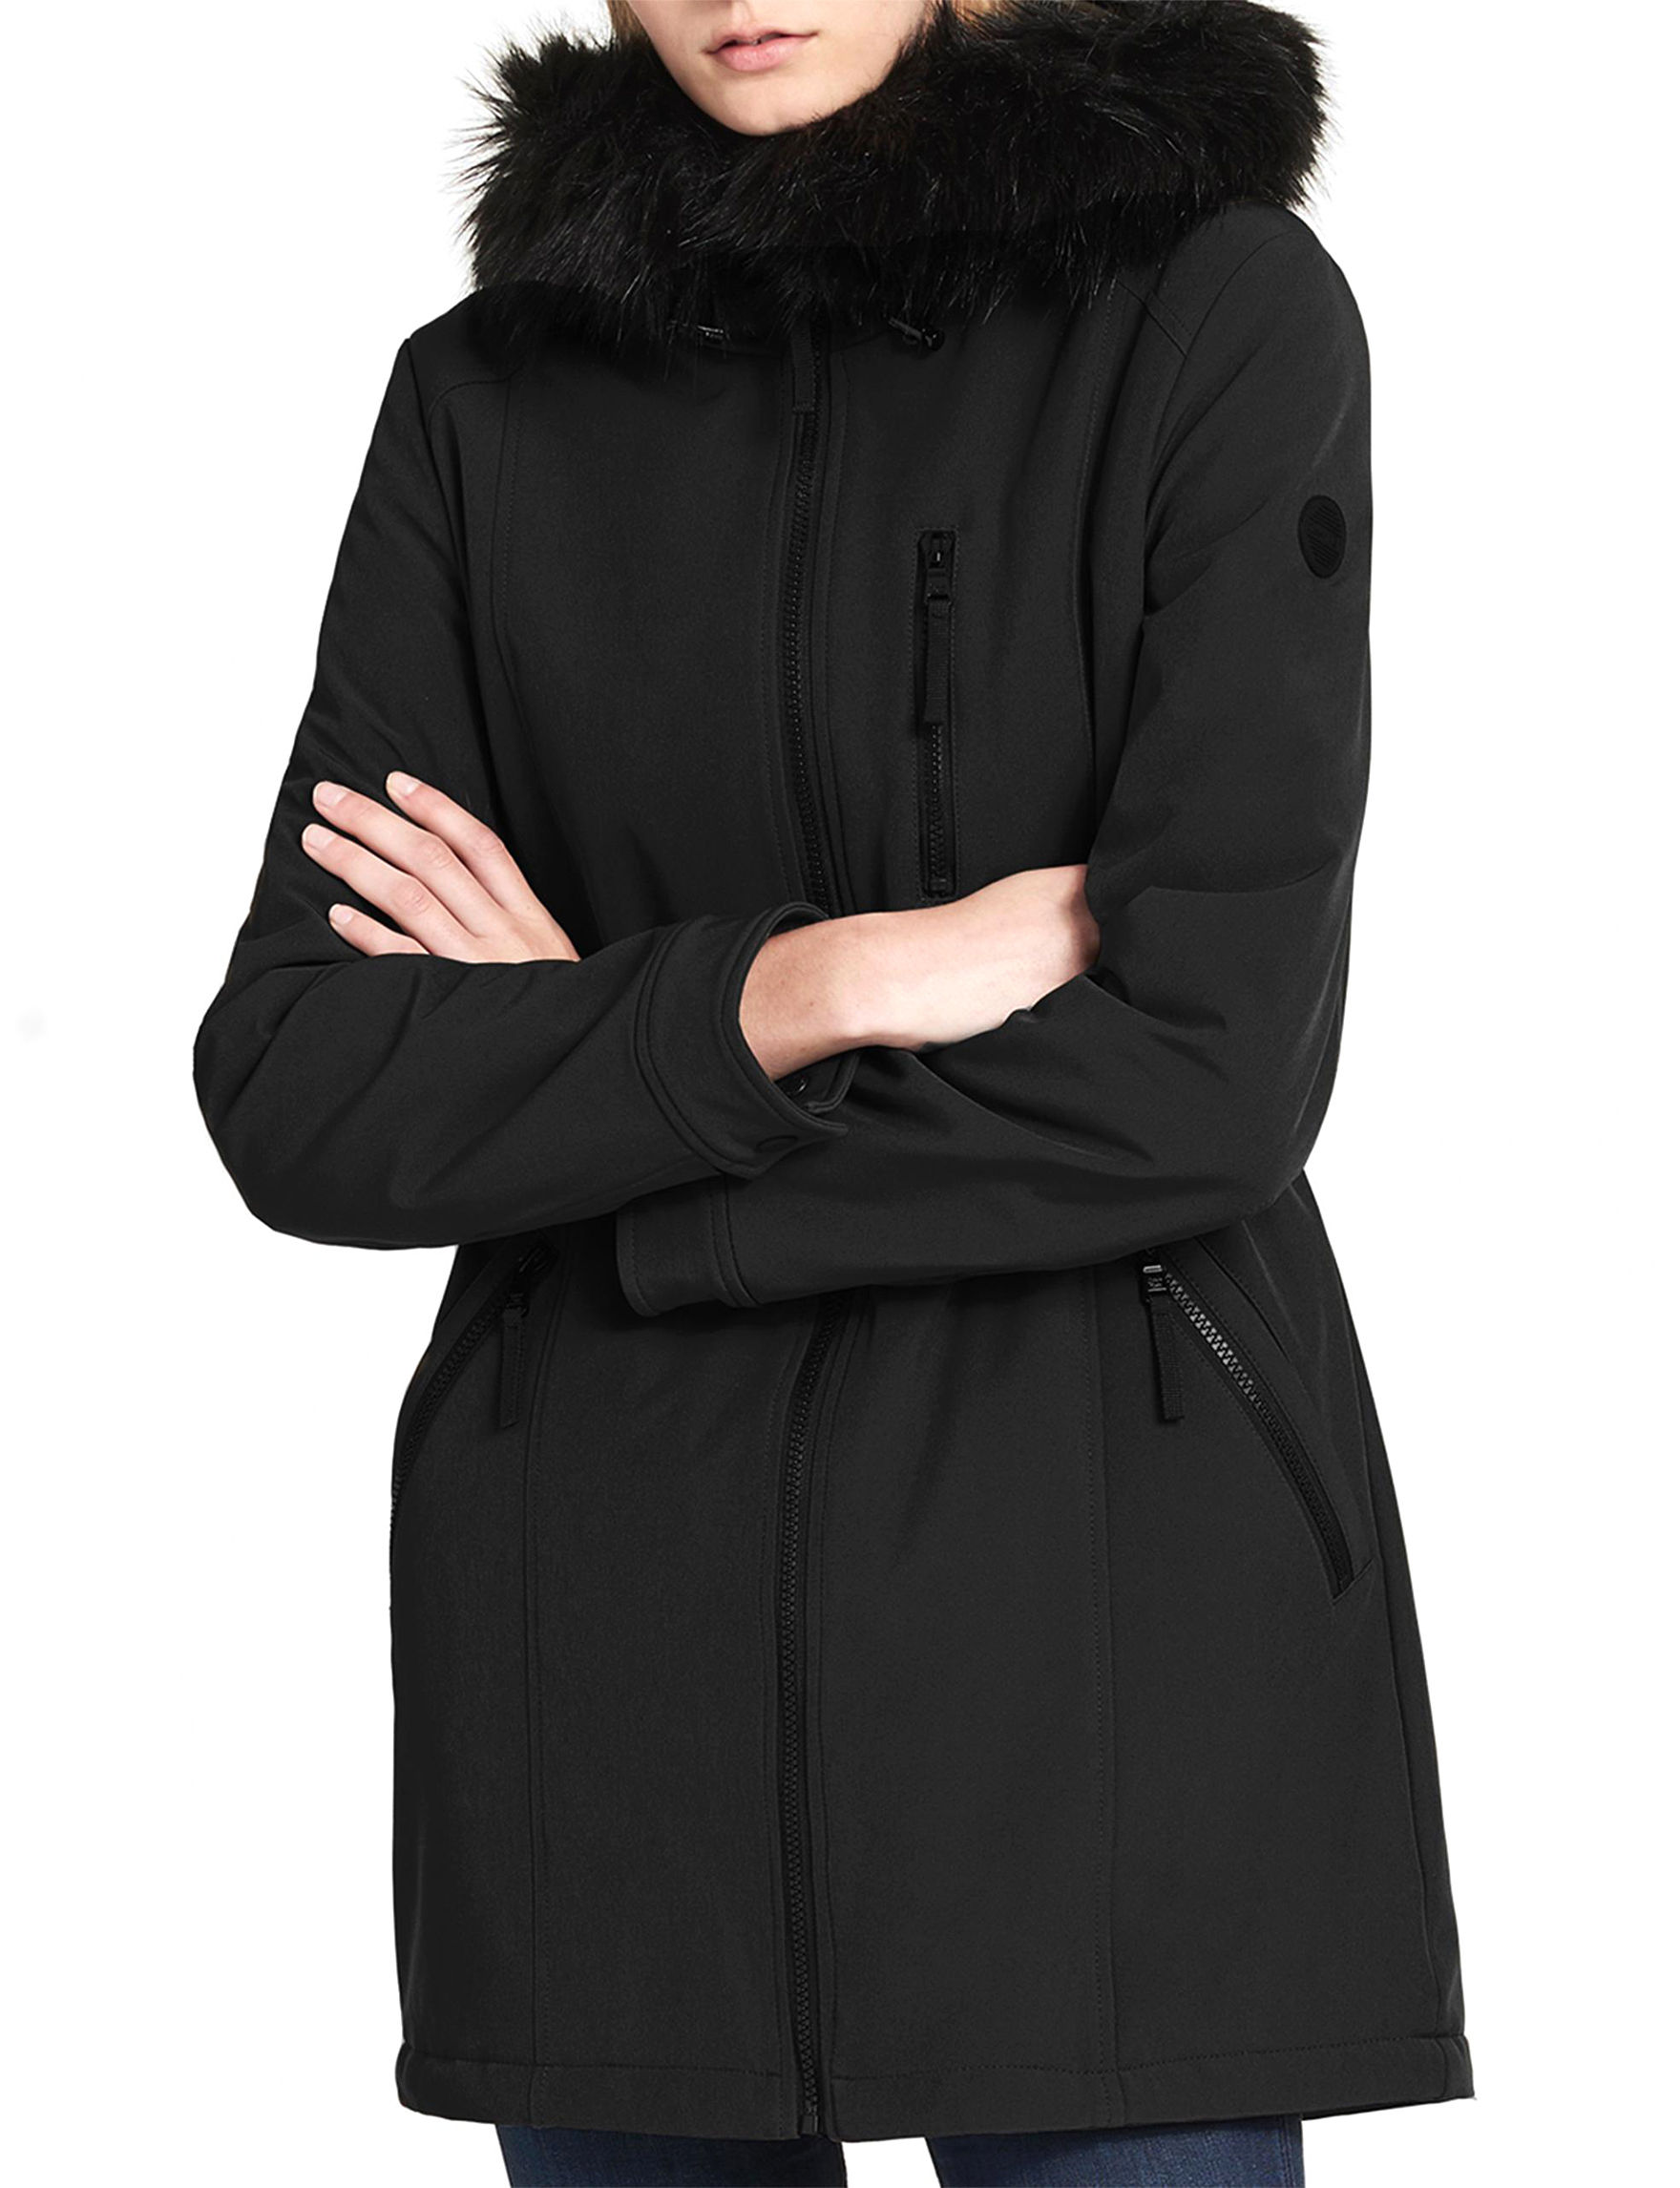 Calvin Klein Black Fleece & Soft Shell Jackets